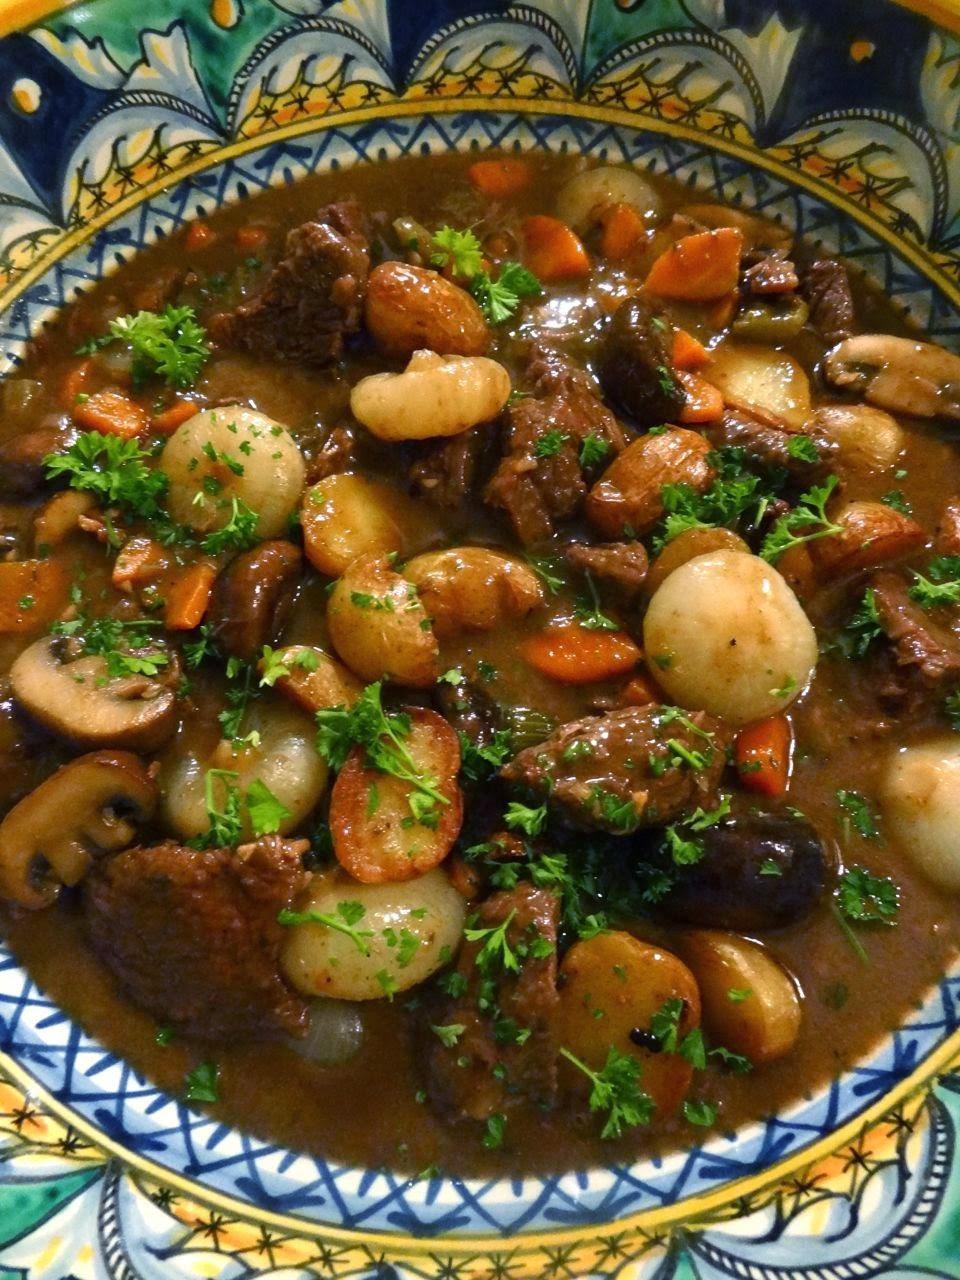 ScrumpdillyiciousBraised Beef  Mushroom Stew with Cipollini Onions